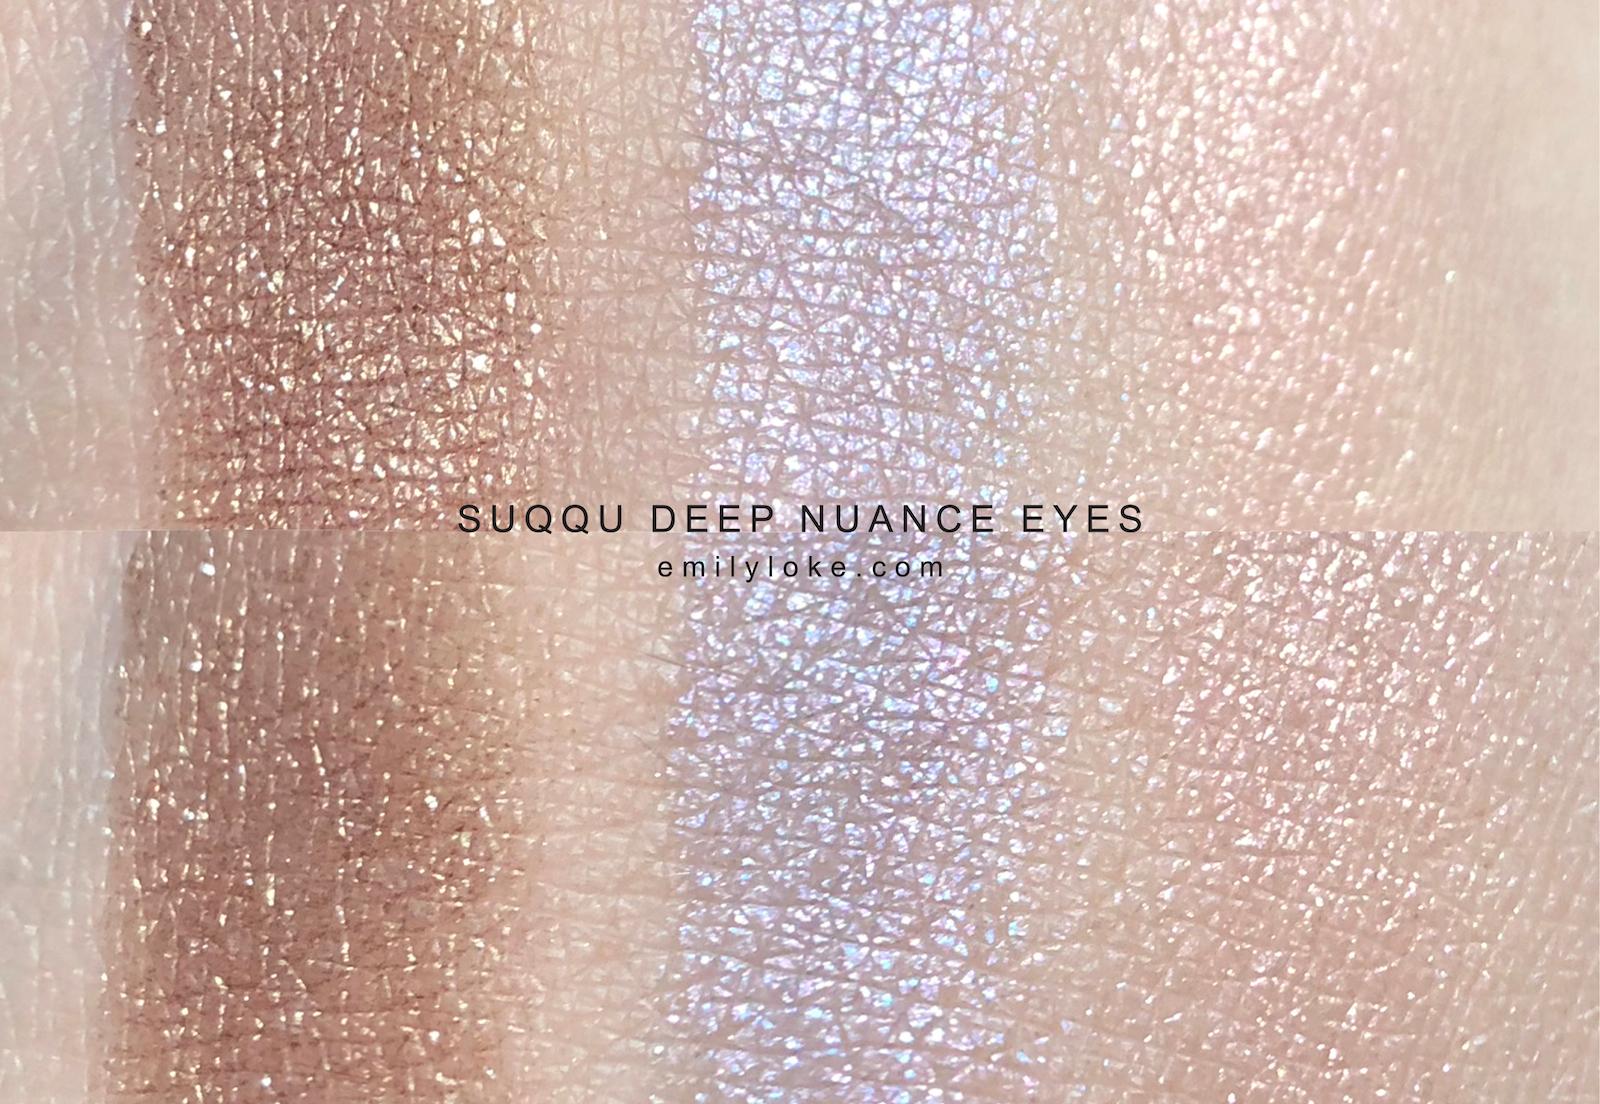 suqqu deep nuance eyes 102 103 104